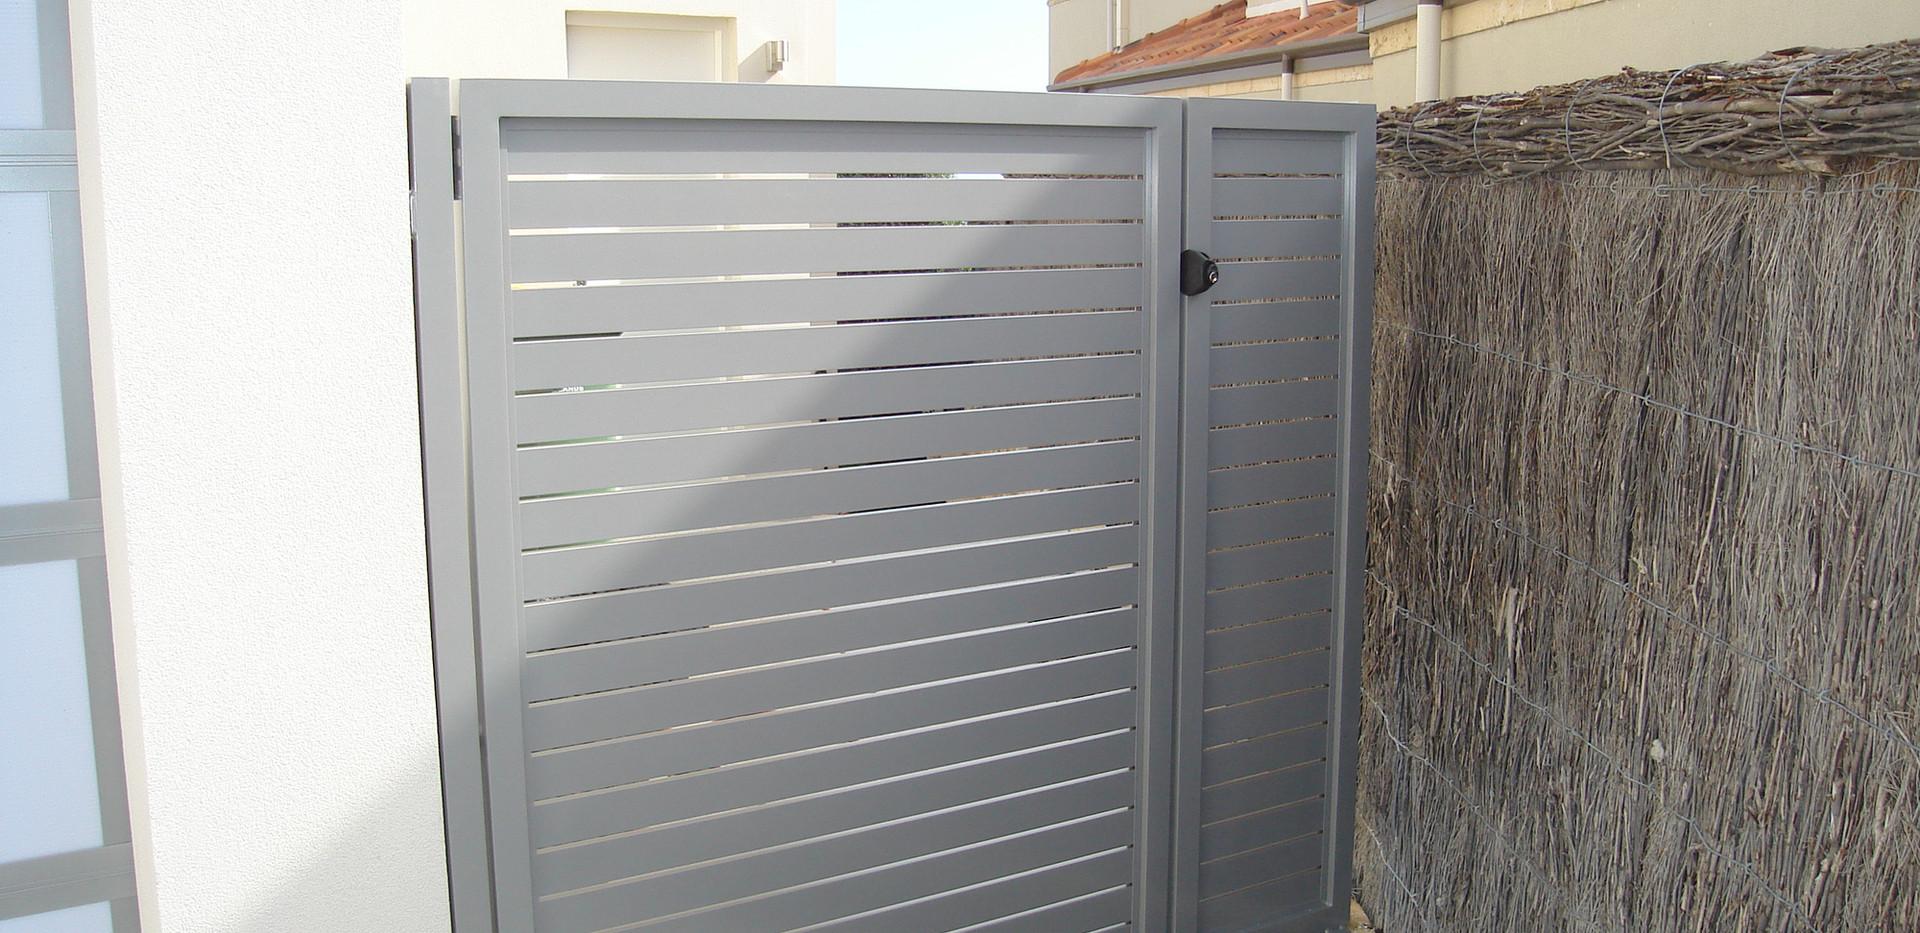 Aluminium Fence - Grey